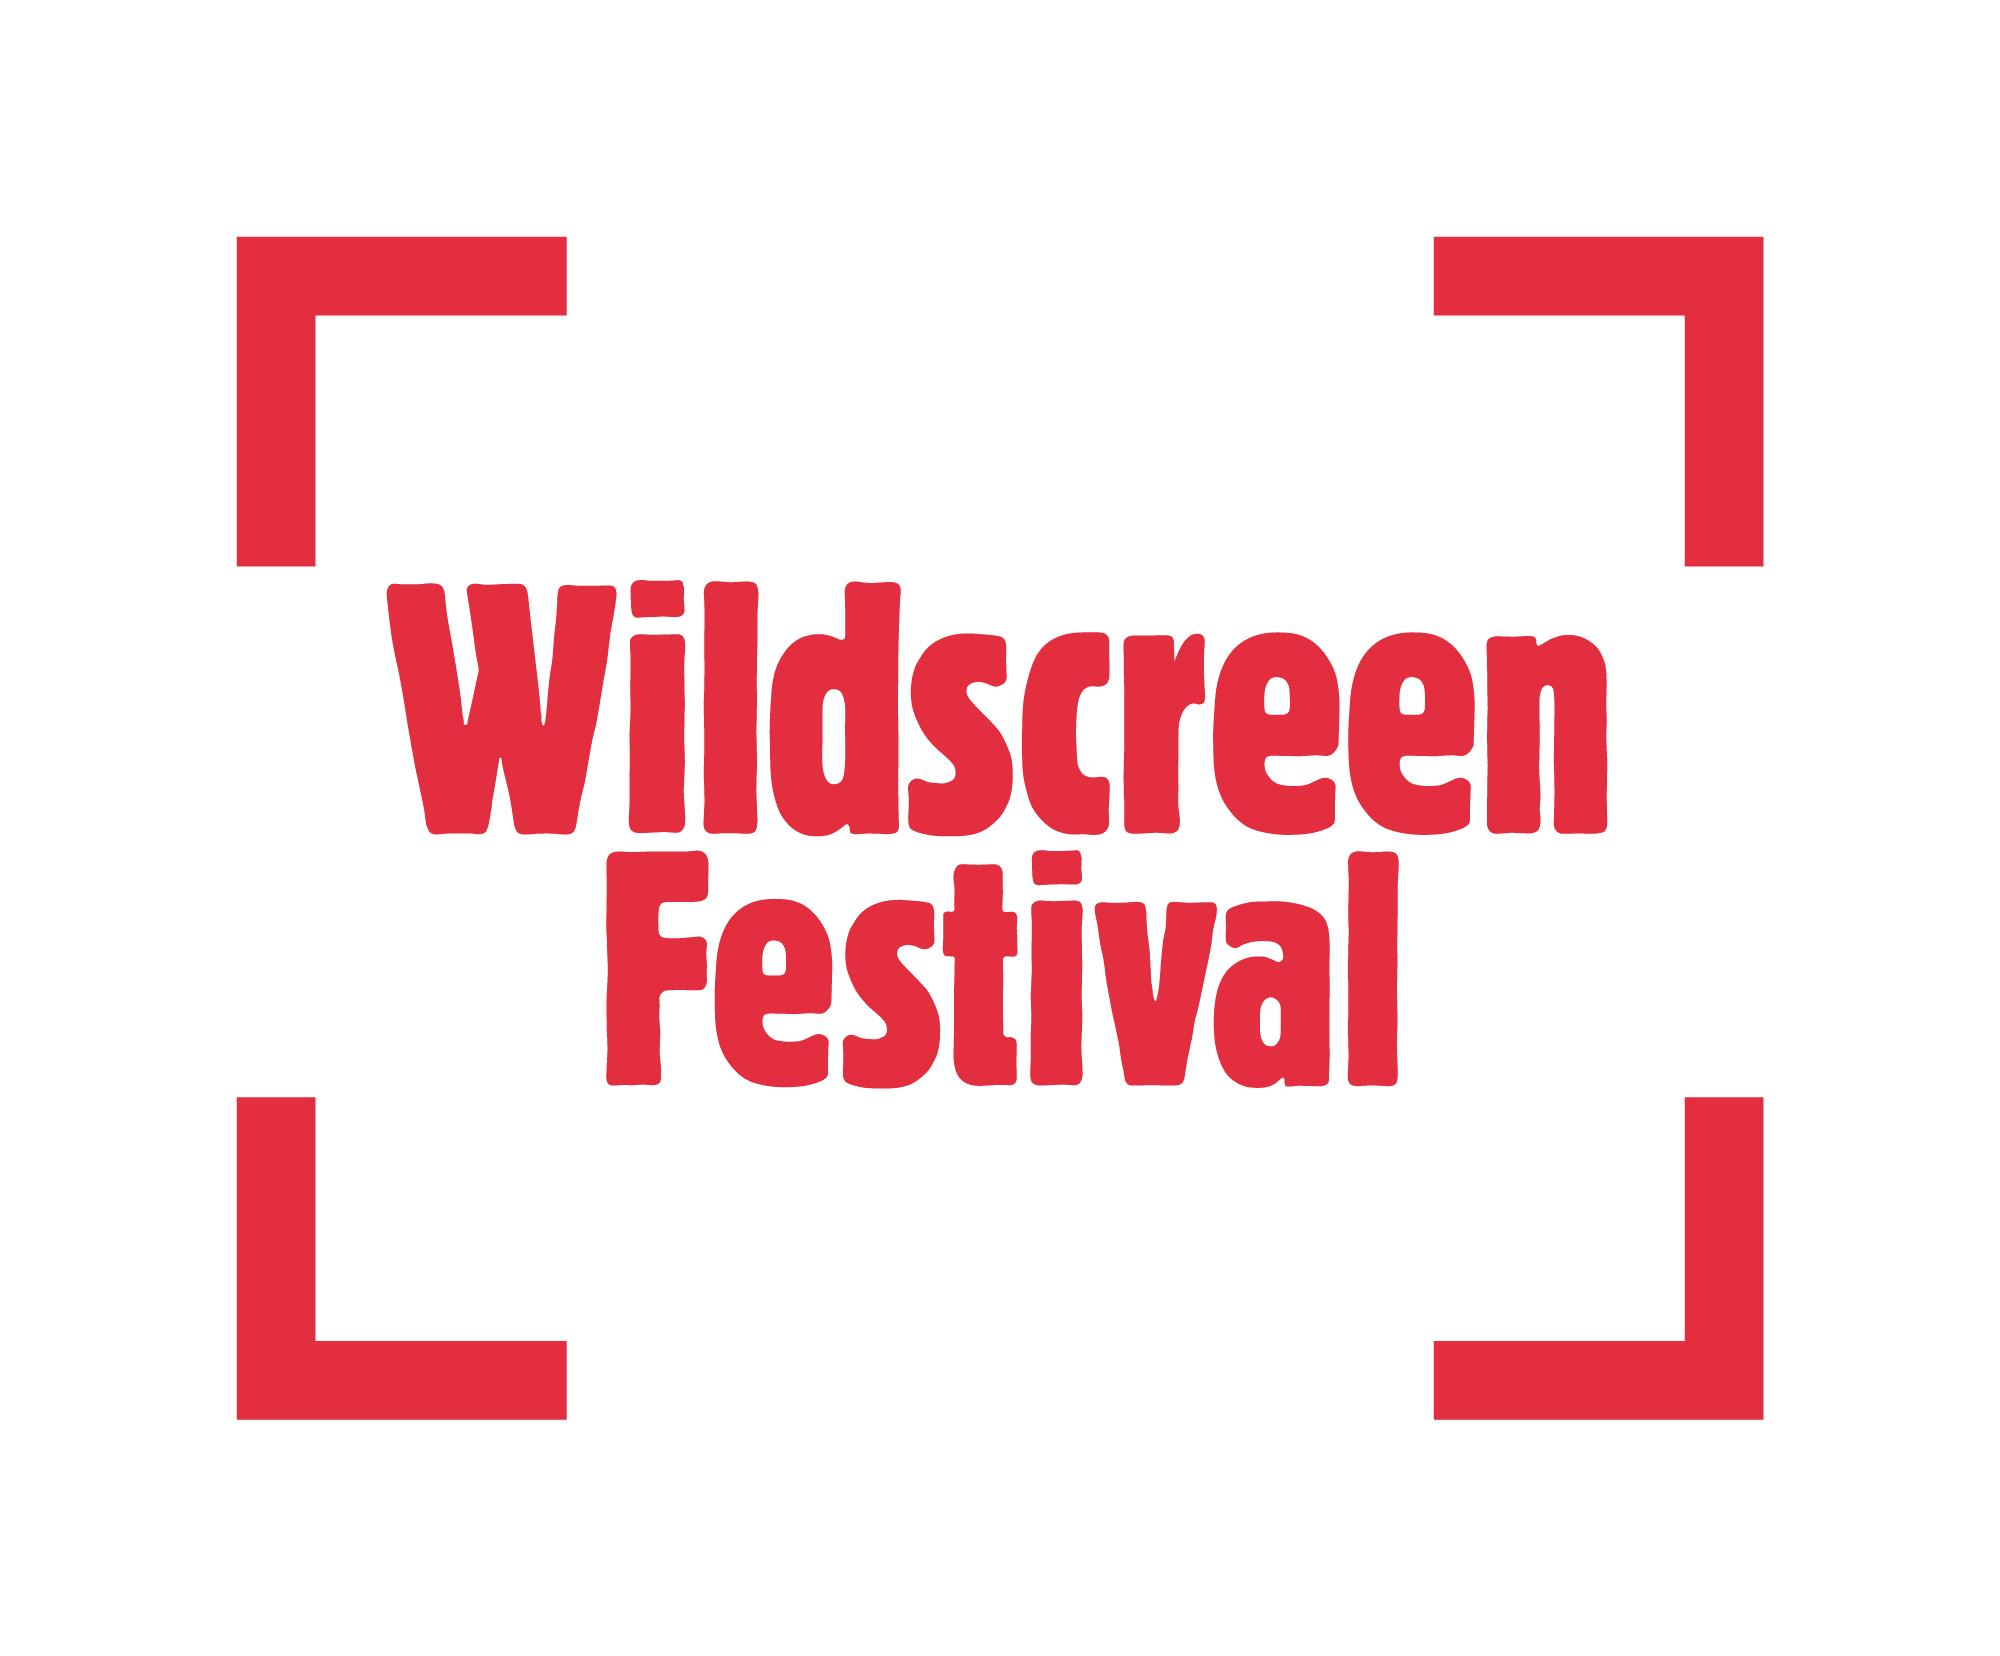 Wildscreen Photo Story Panda Award 2020 - logo